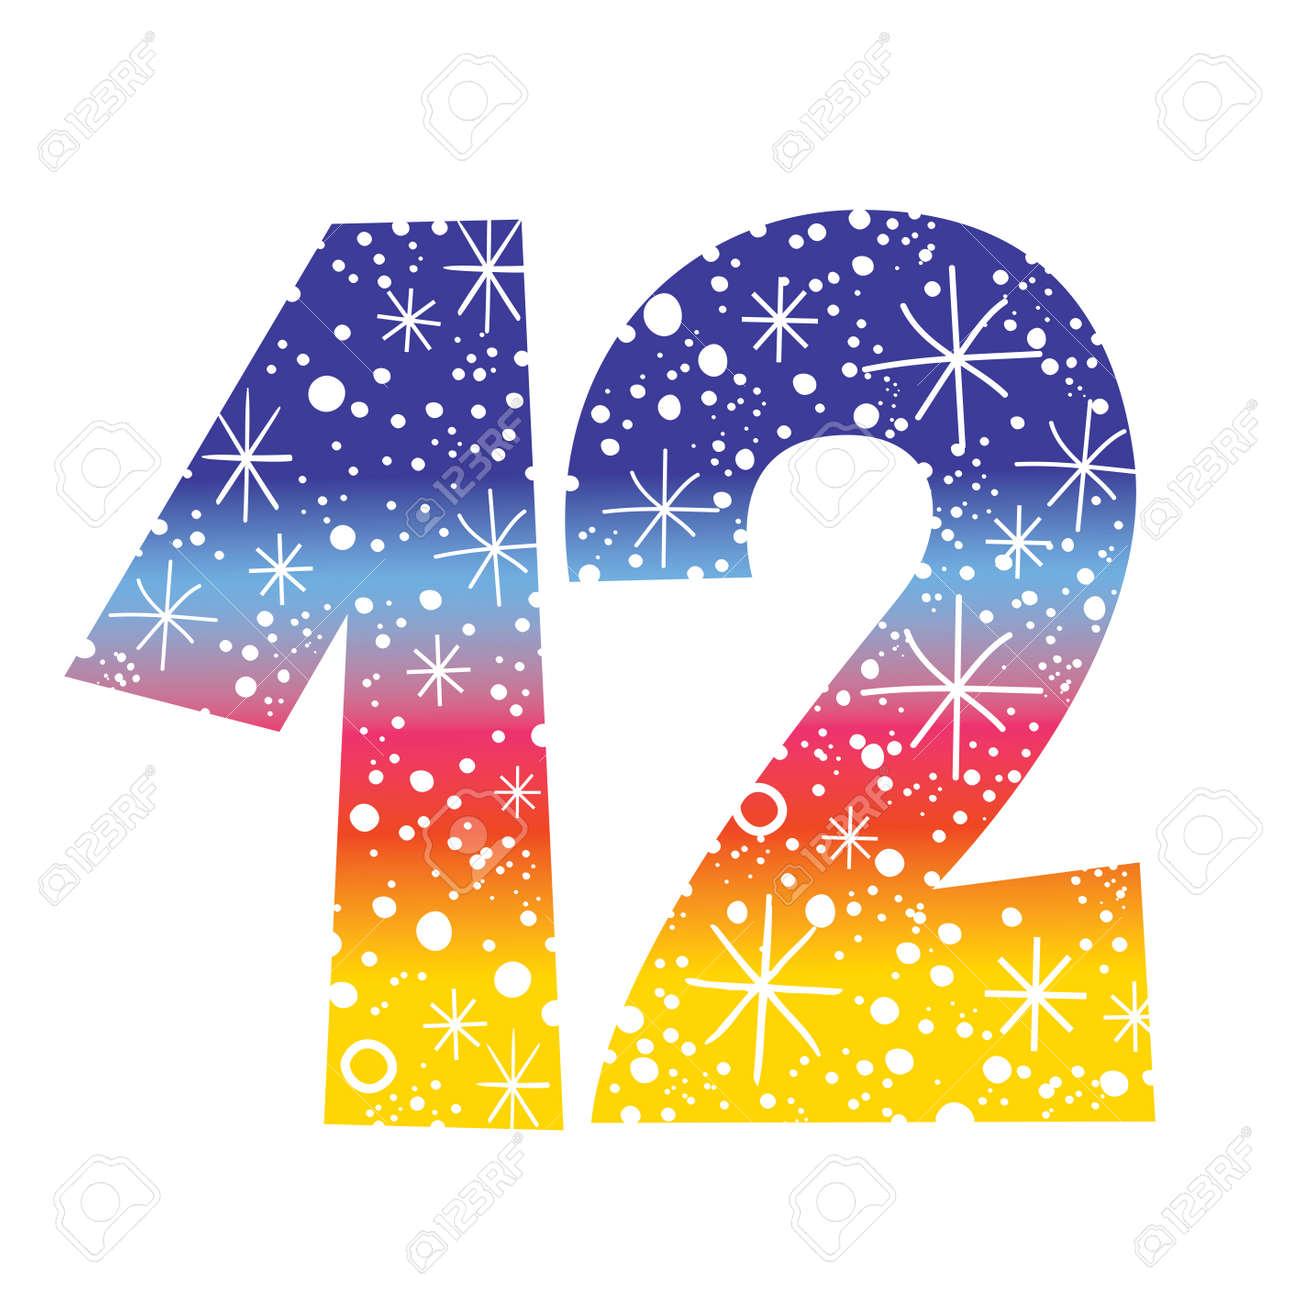 Celebratory Number Twelve For Birthdays Celebrations Royalty Free ...